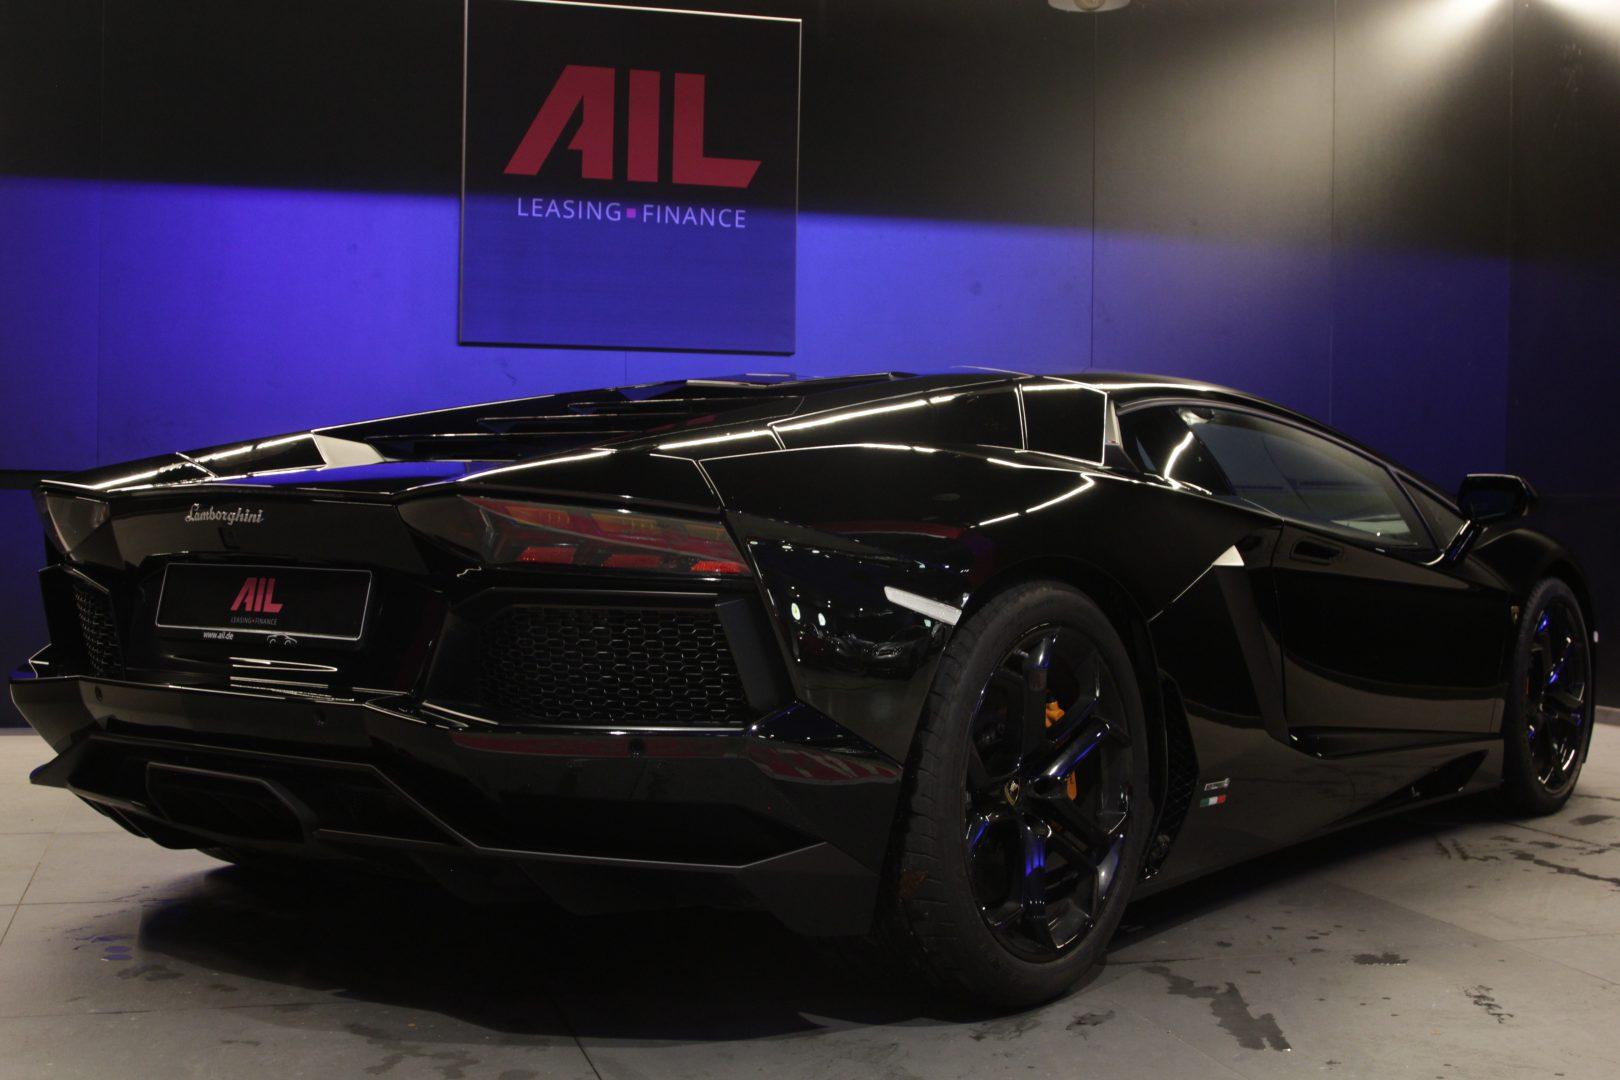 AIL Lamborghini Aventador LP 700-4 10